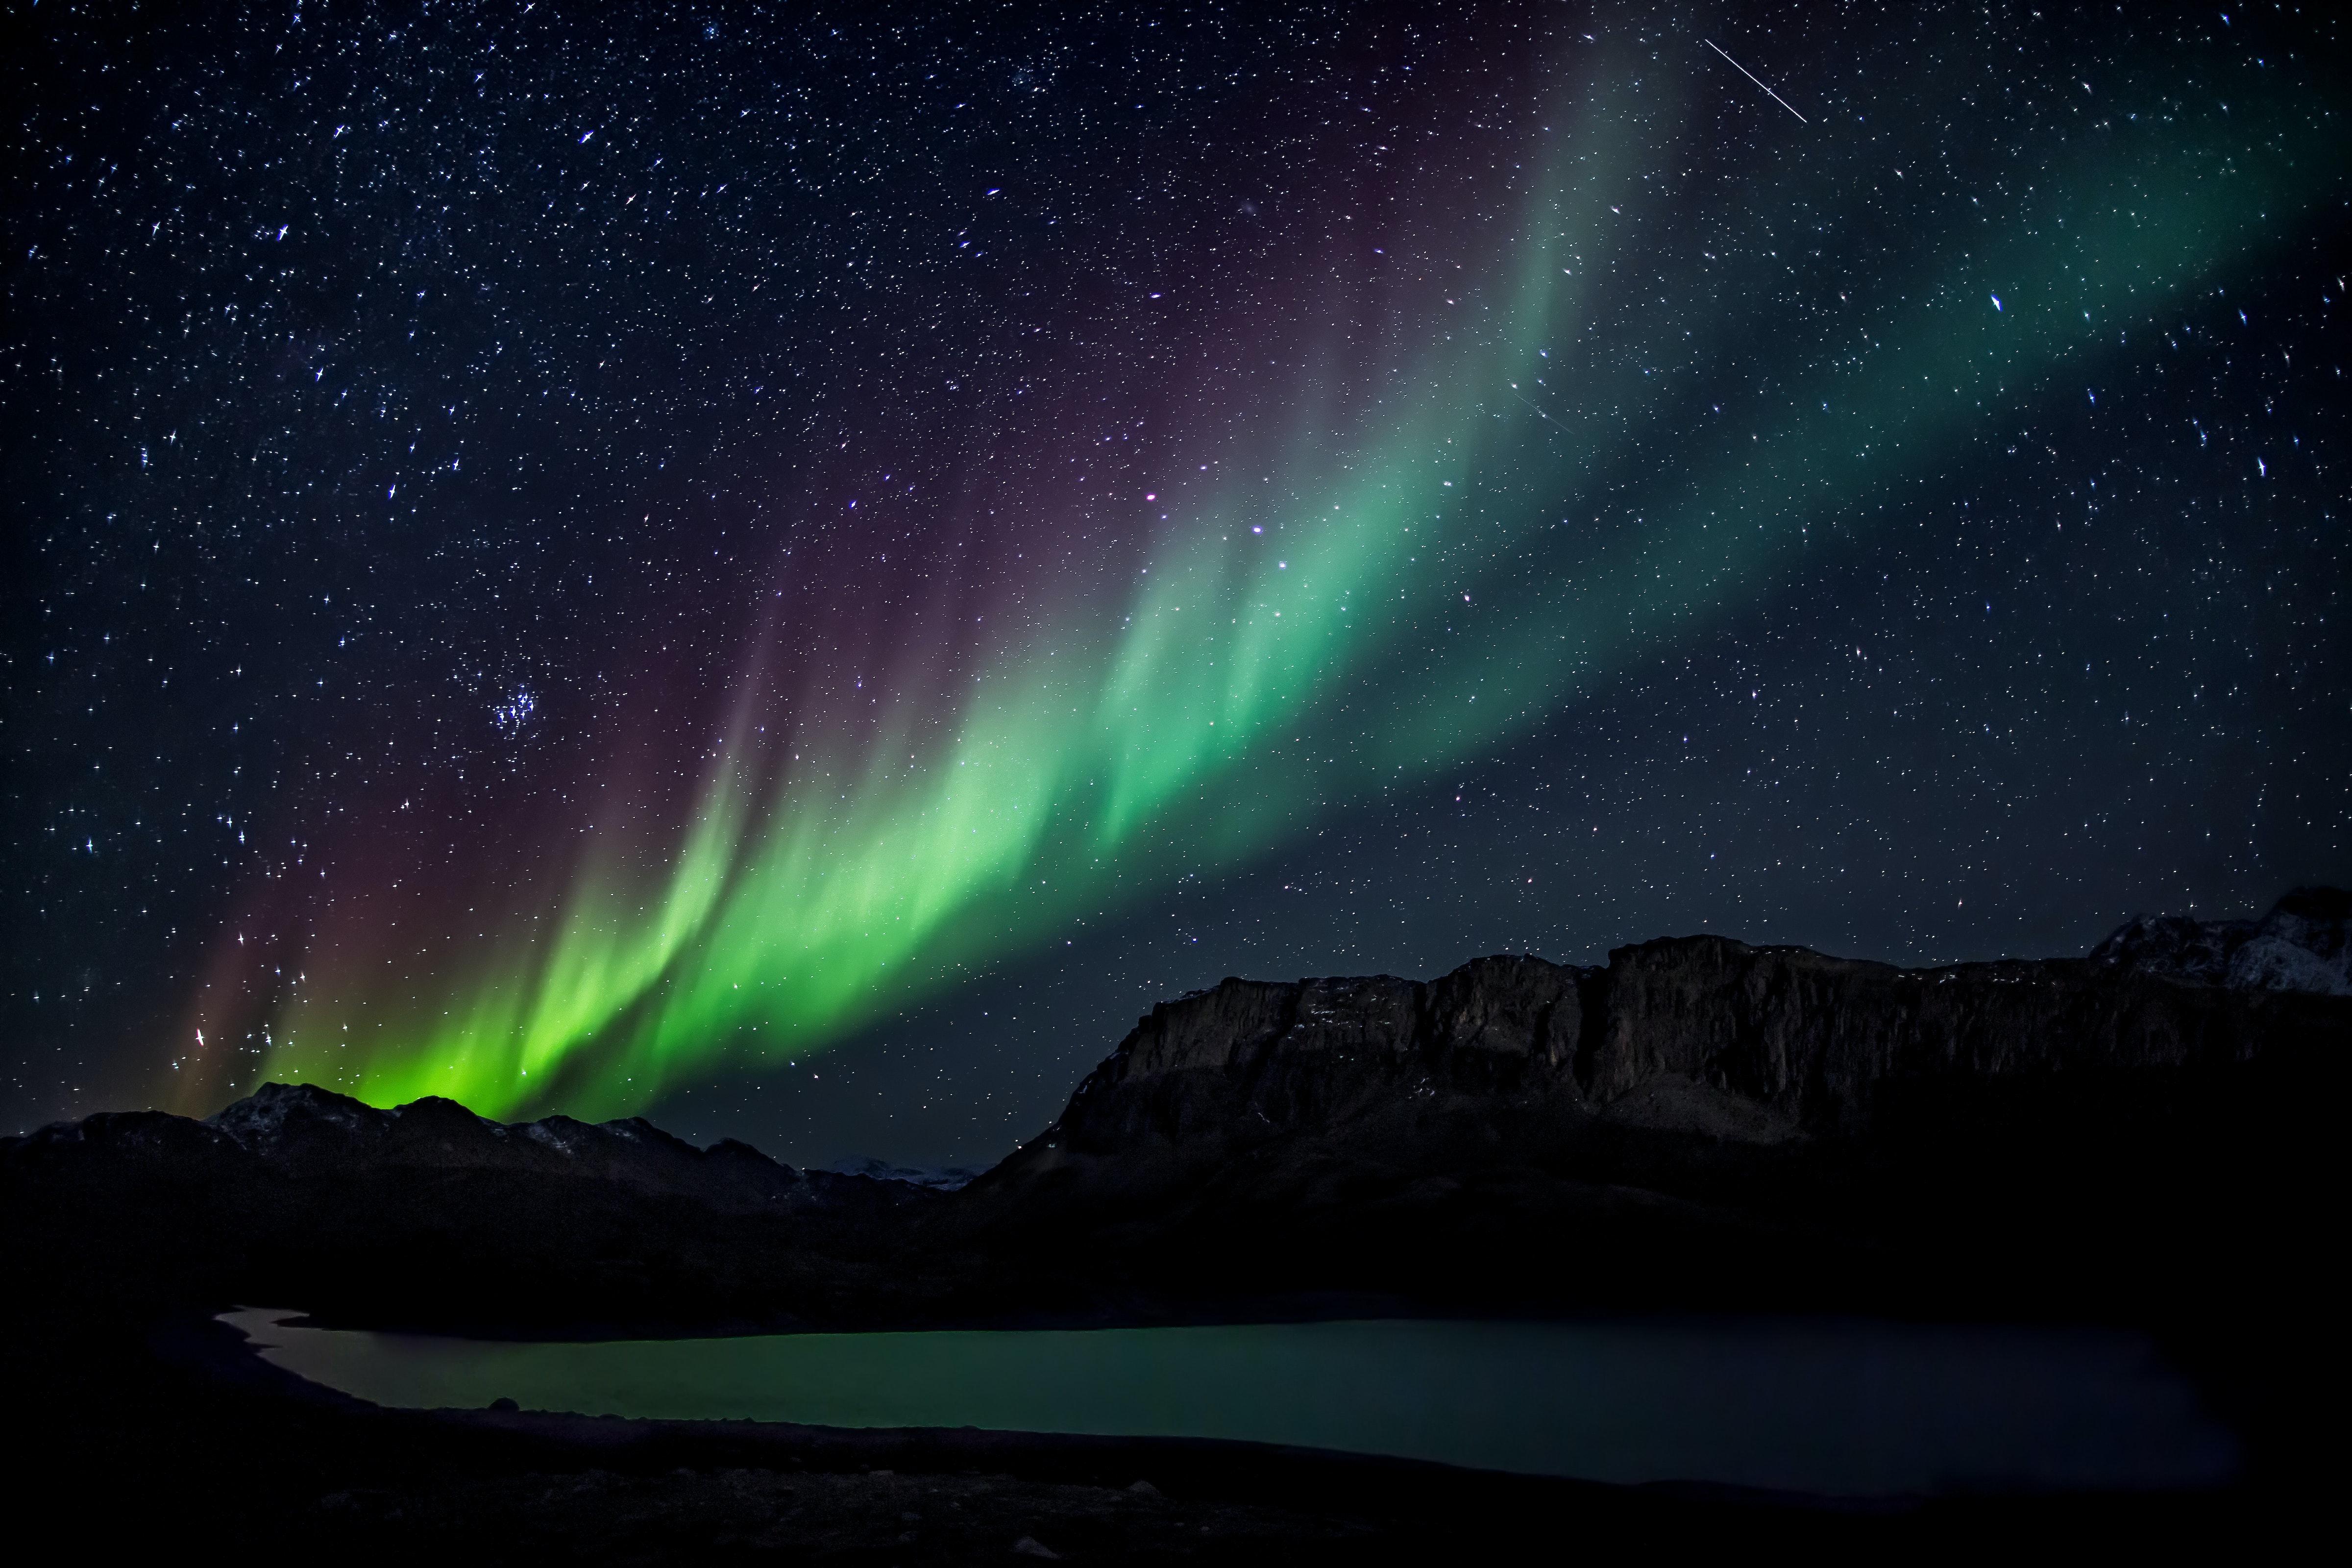 Green, blue and purple aurora borealis.